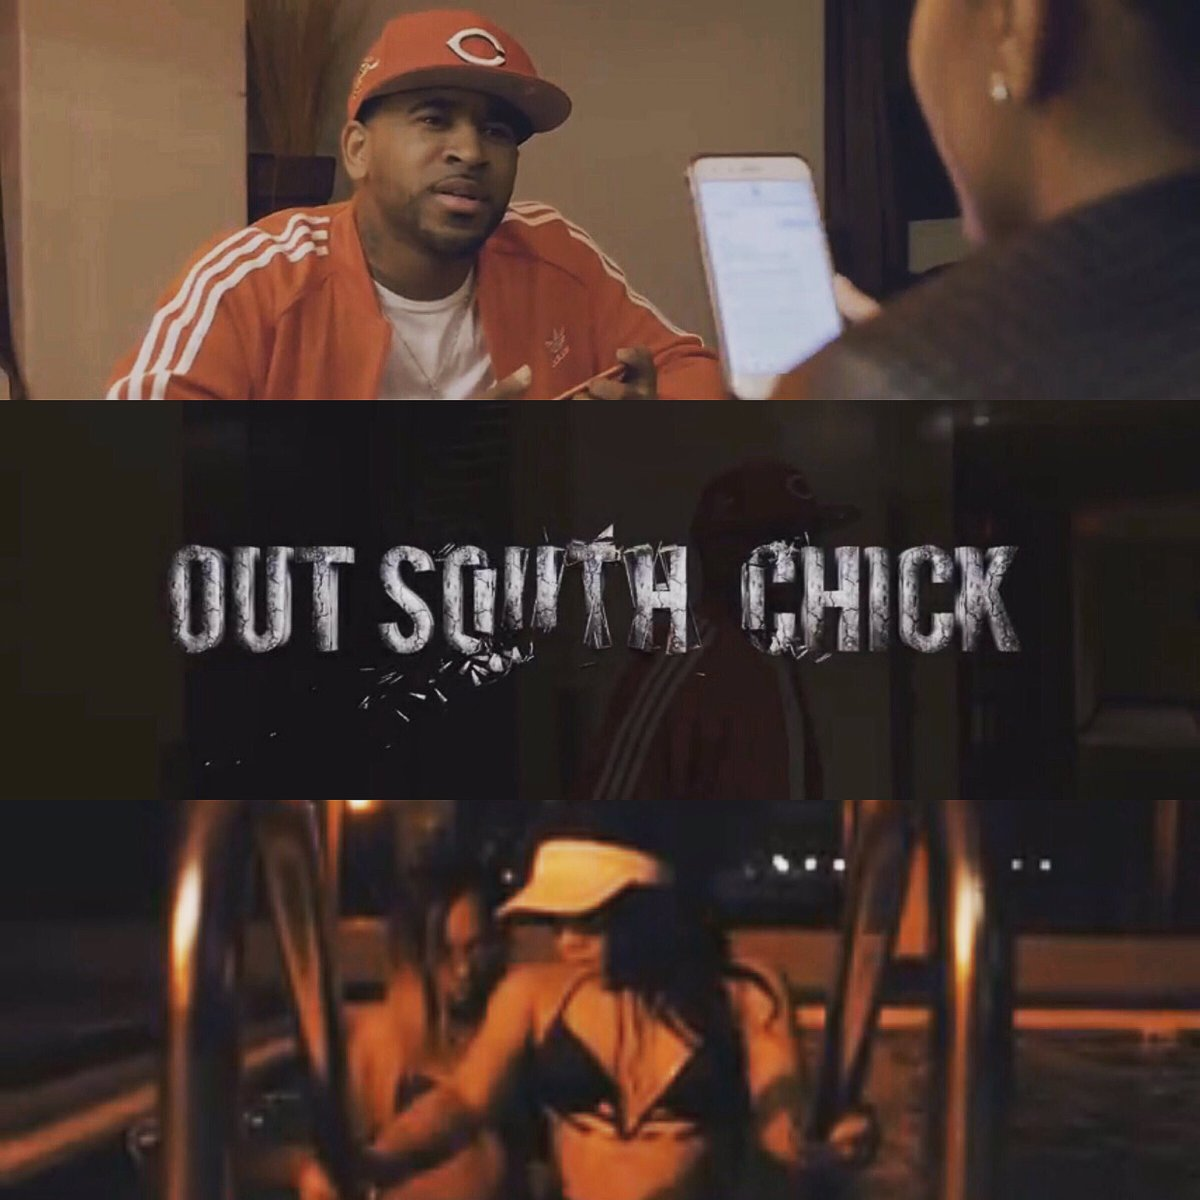 #OutSouthChick